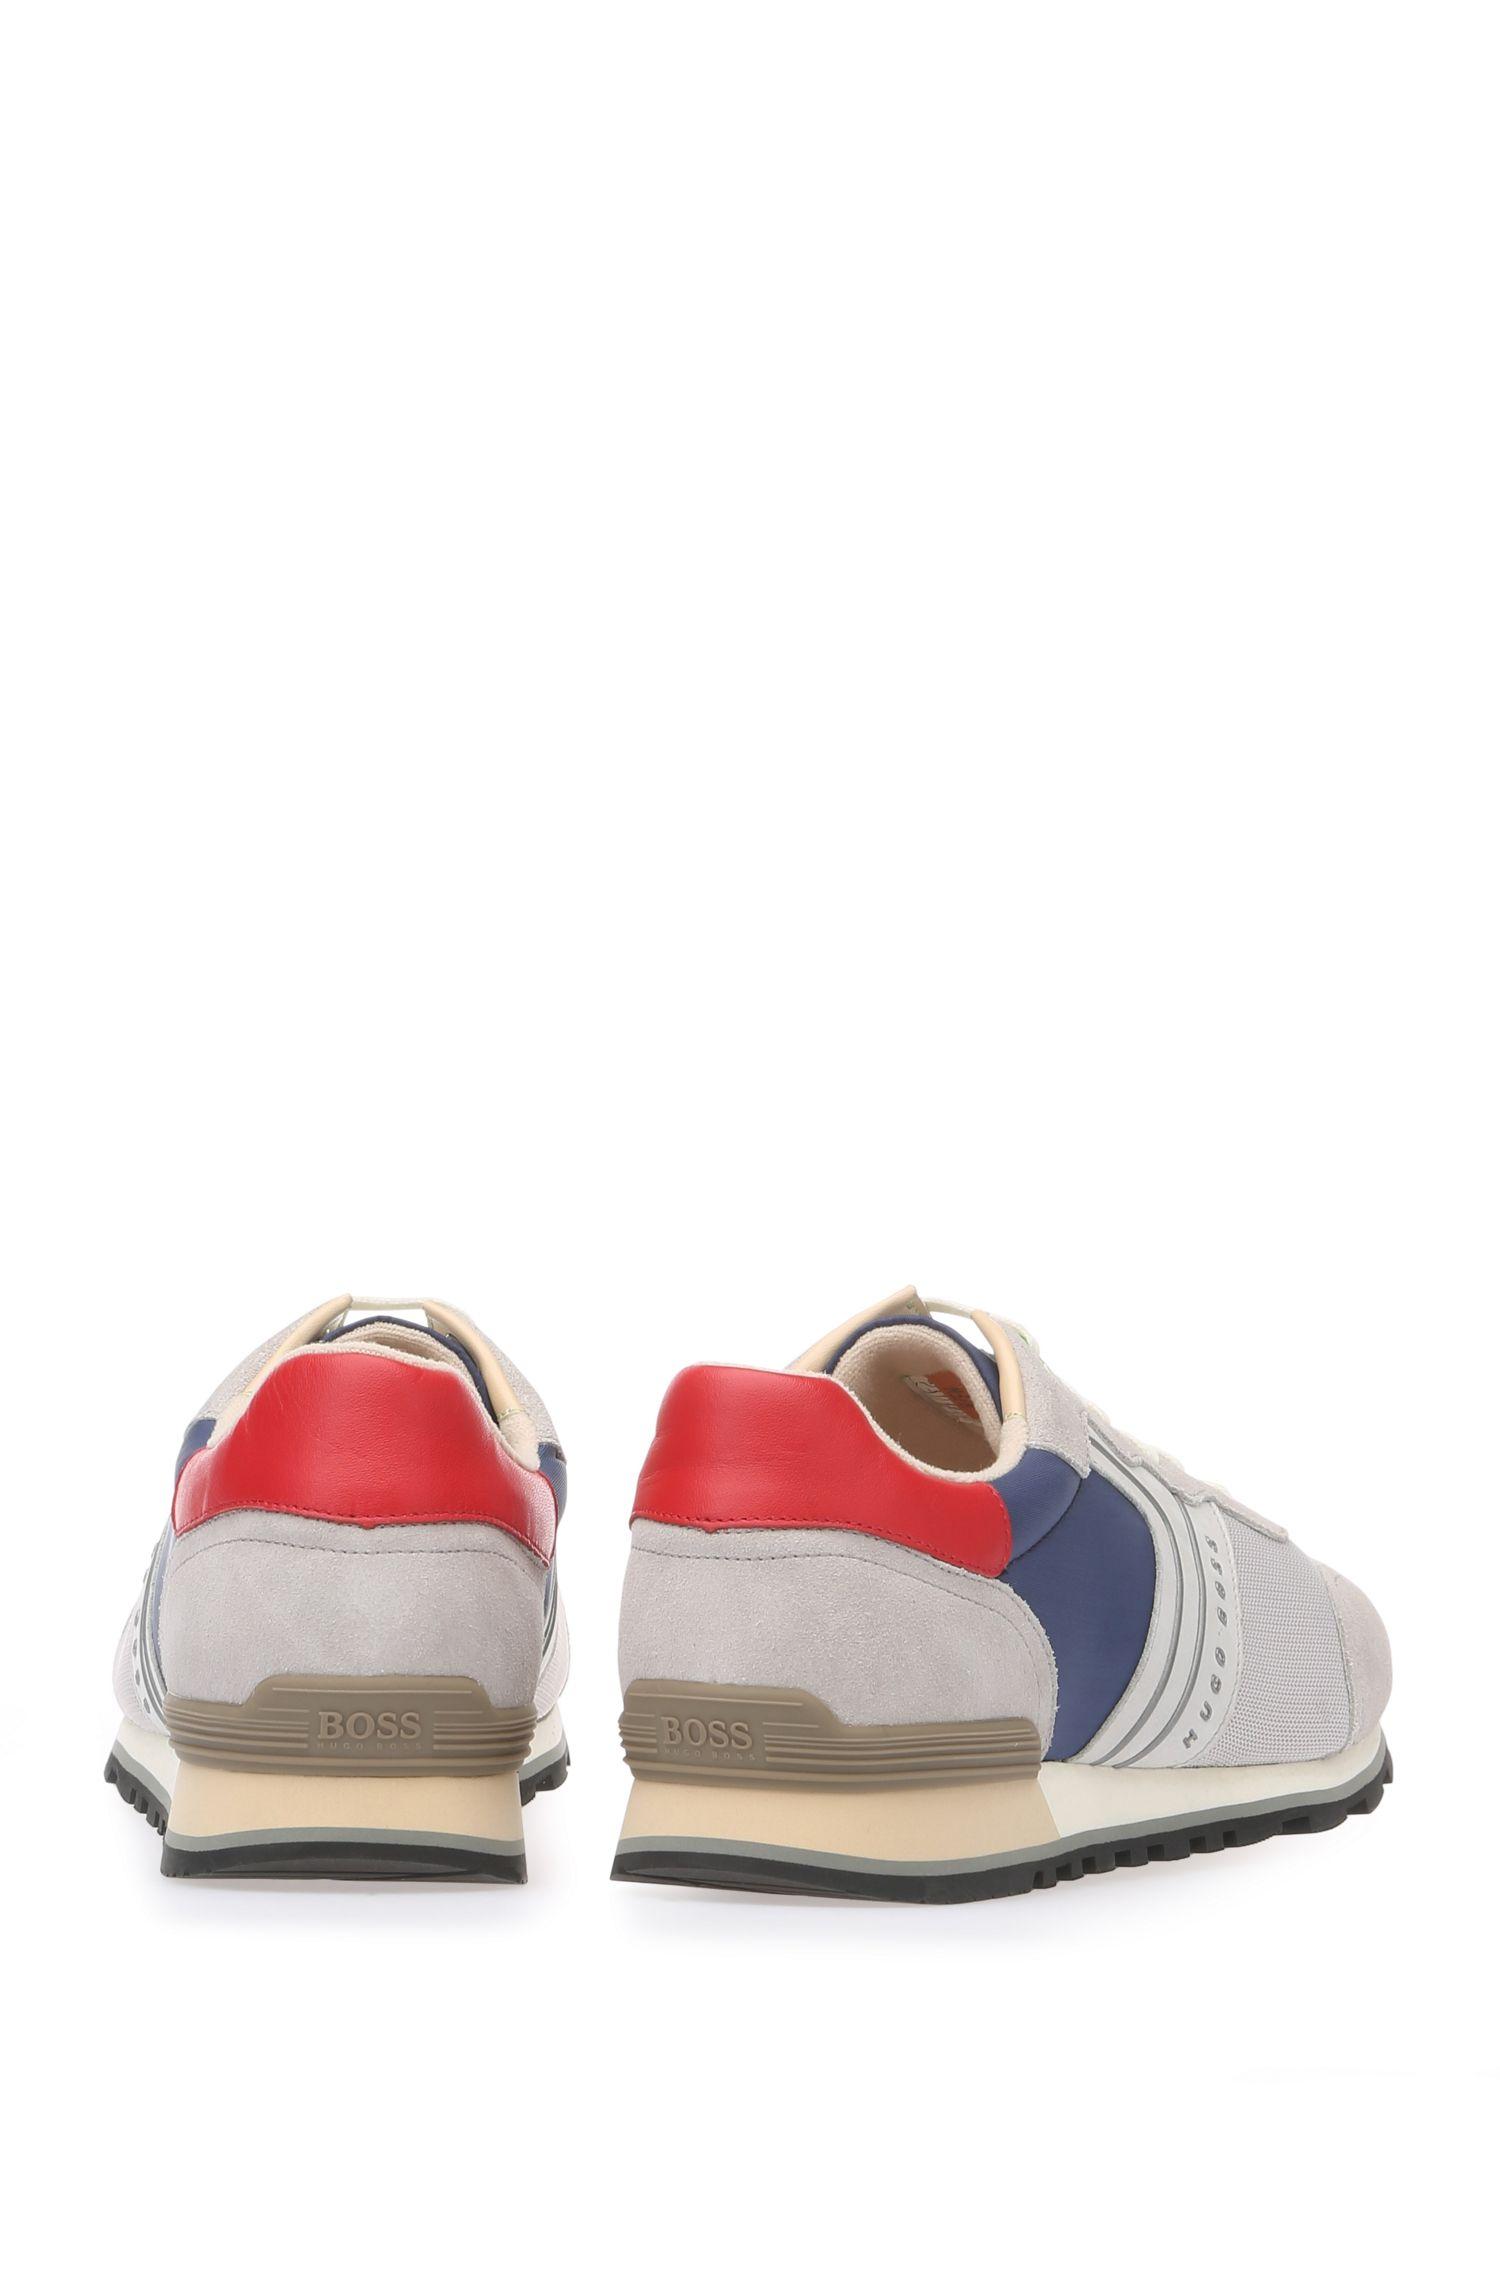 Sneakers aus Material-Mix mit Leder: ´Parkour_Runn_nymx`